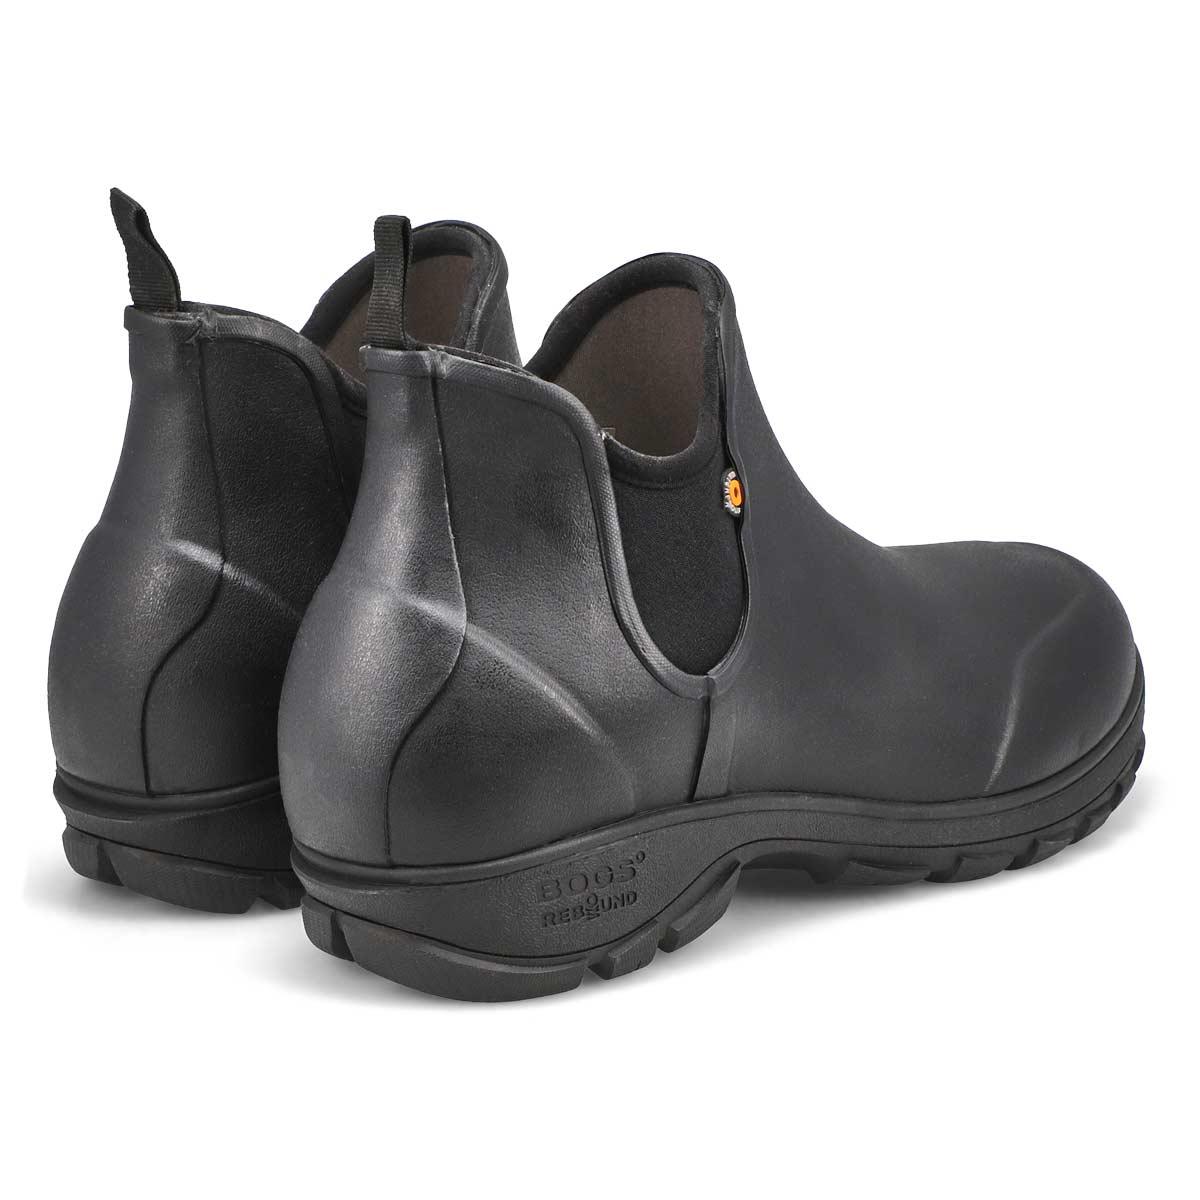 Mns Sauvie black wtpf slip on boot